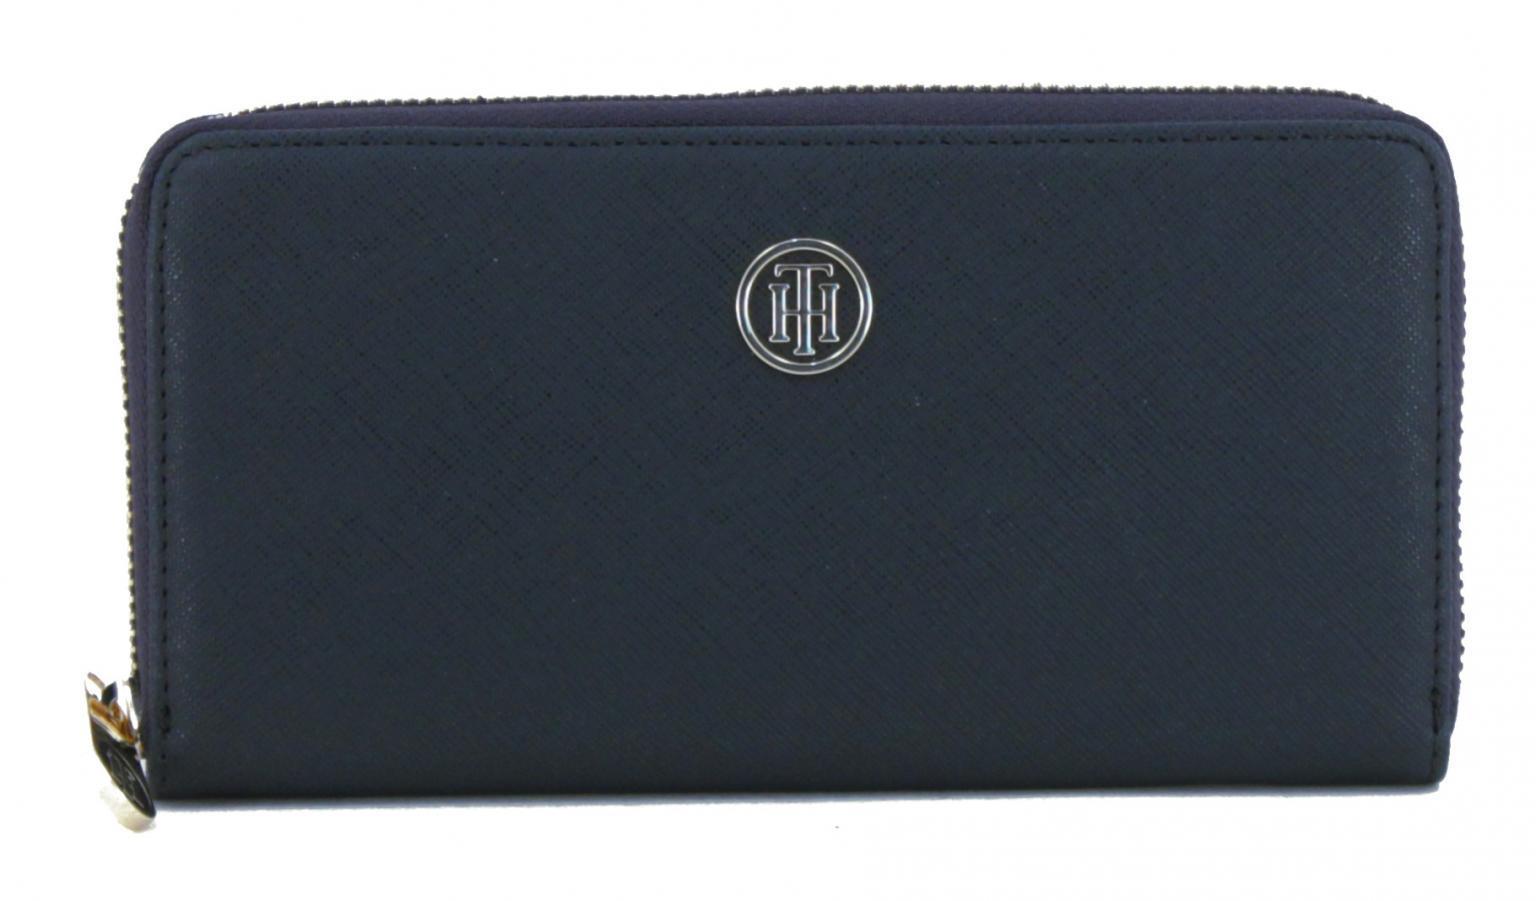 Portemonnaie Tommy Hilfiger Honey LRG ZA Wallet dunkelblau